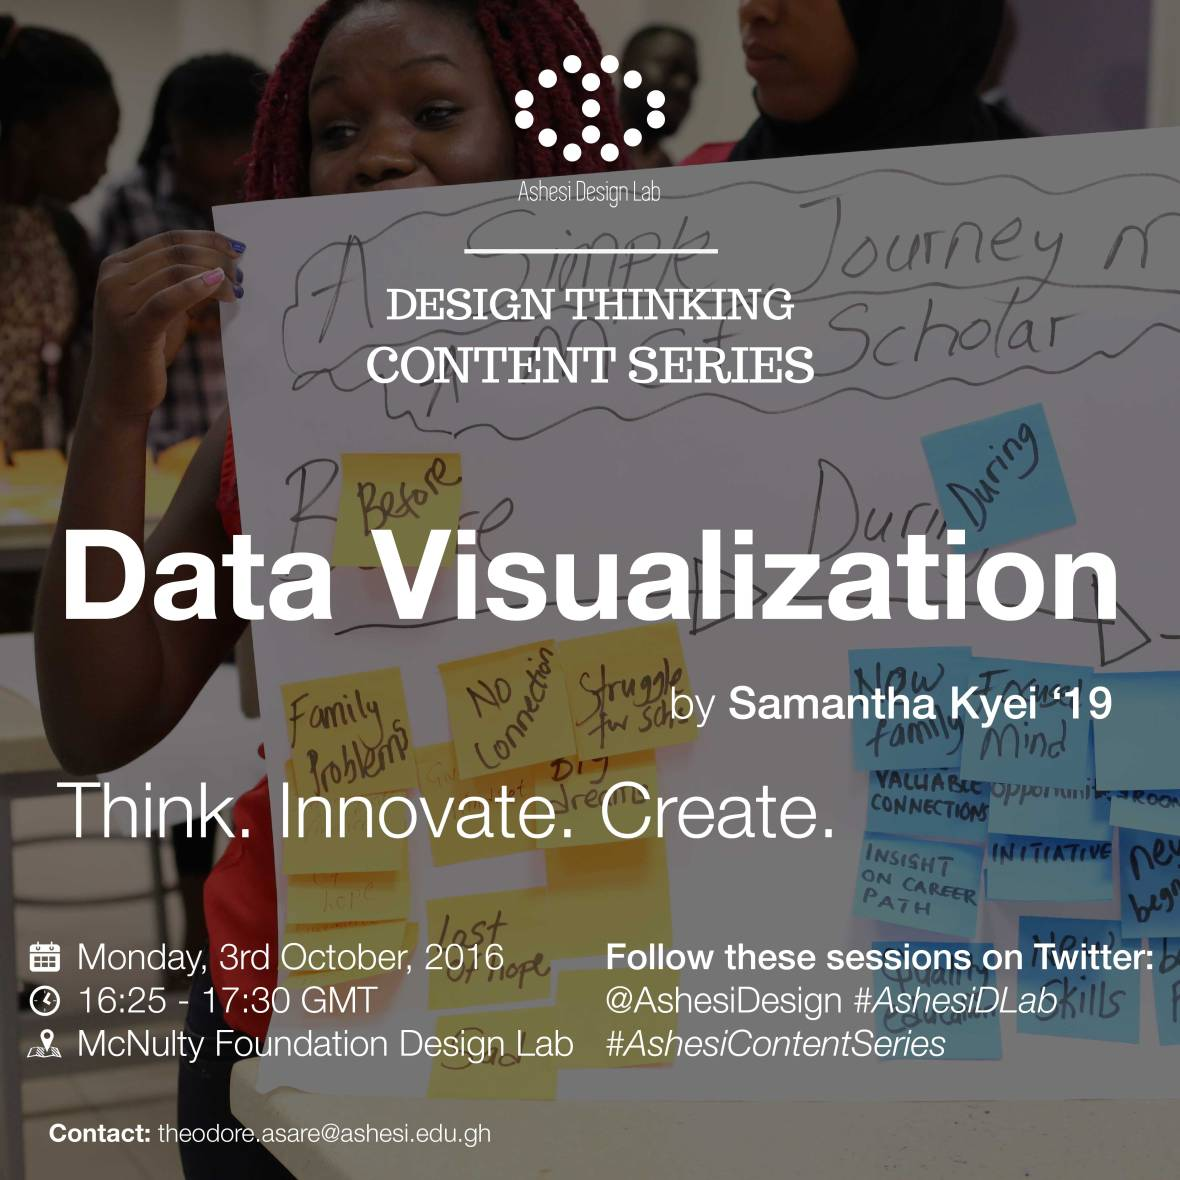 ashesi-dlab-content-series-data-visualisation-01-01